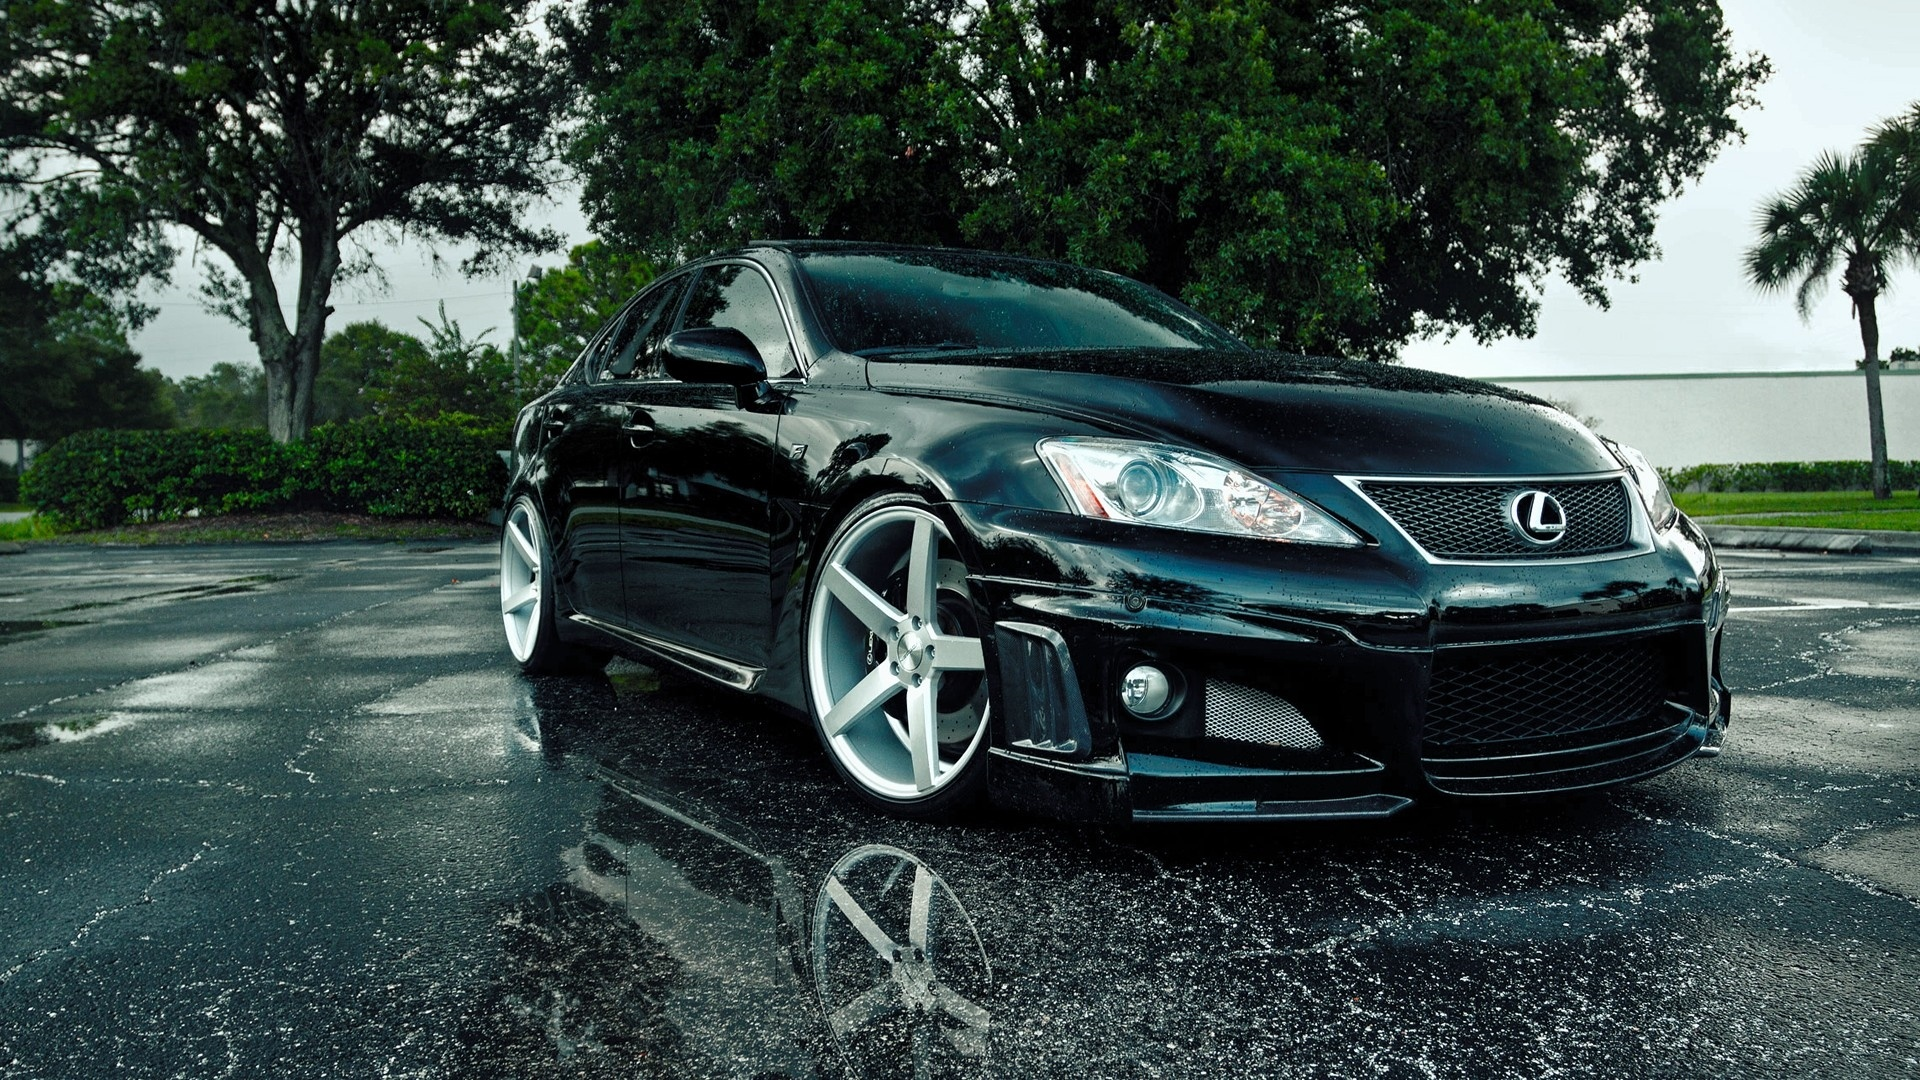 Lexus cool background